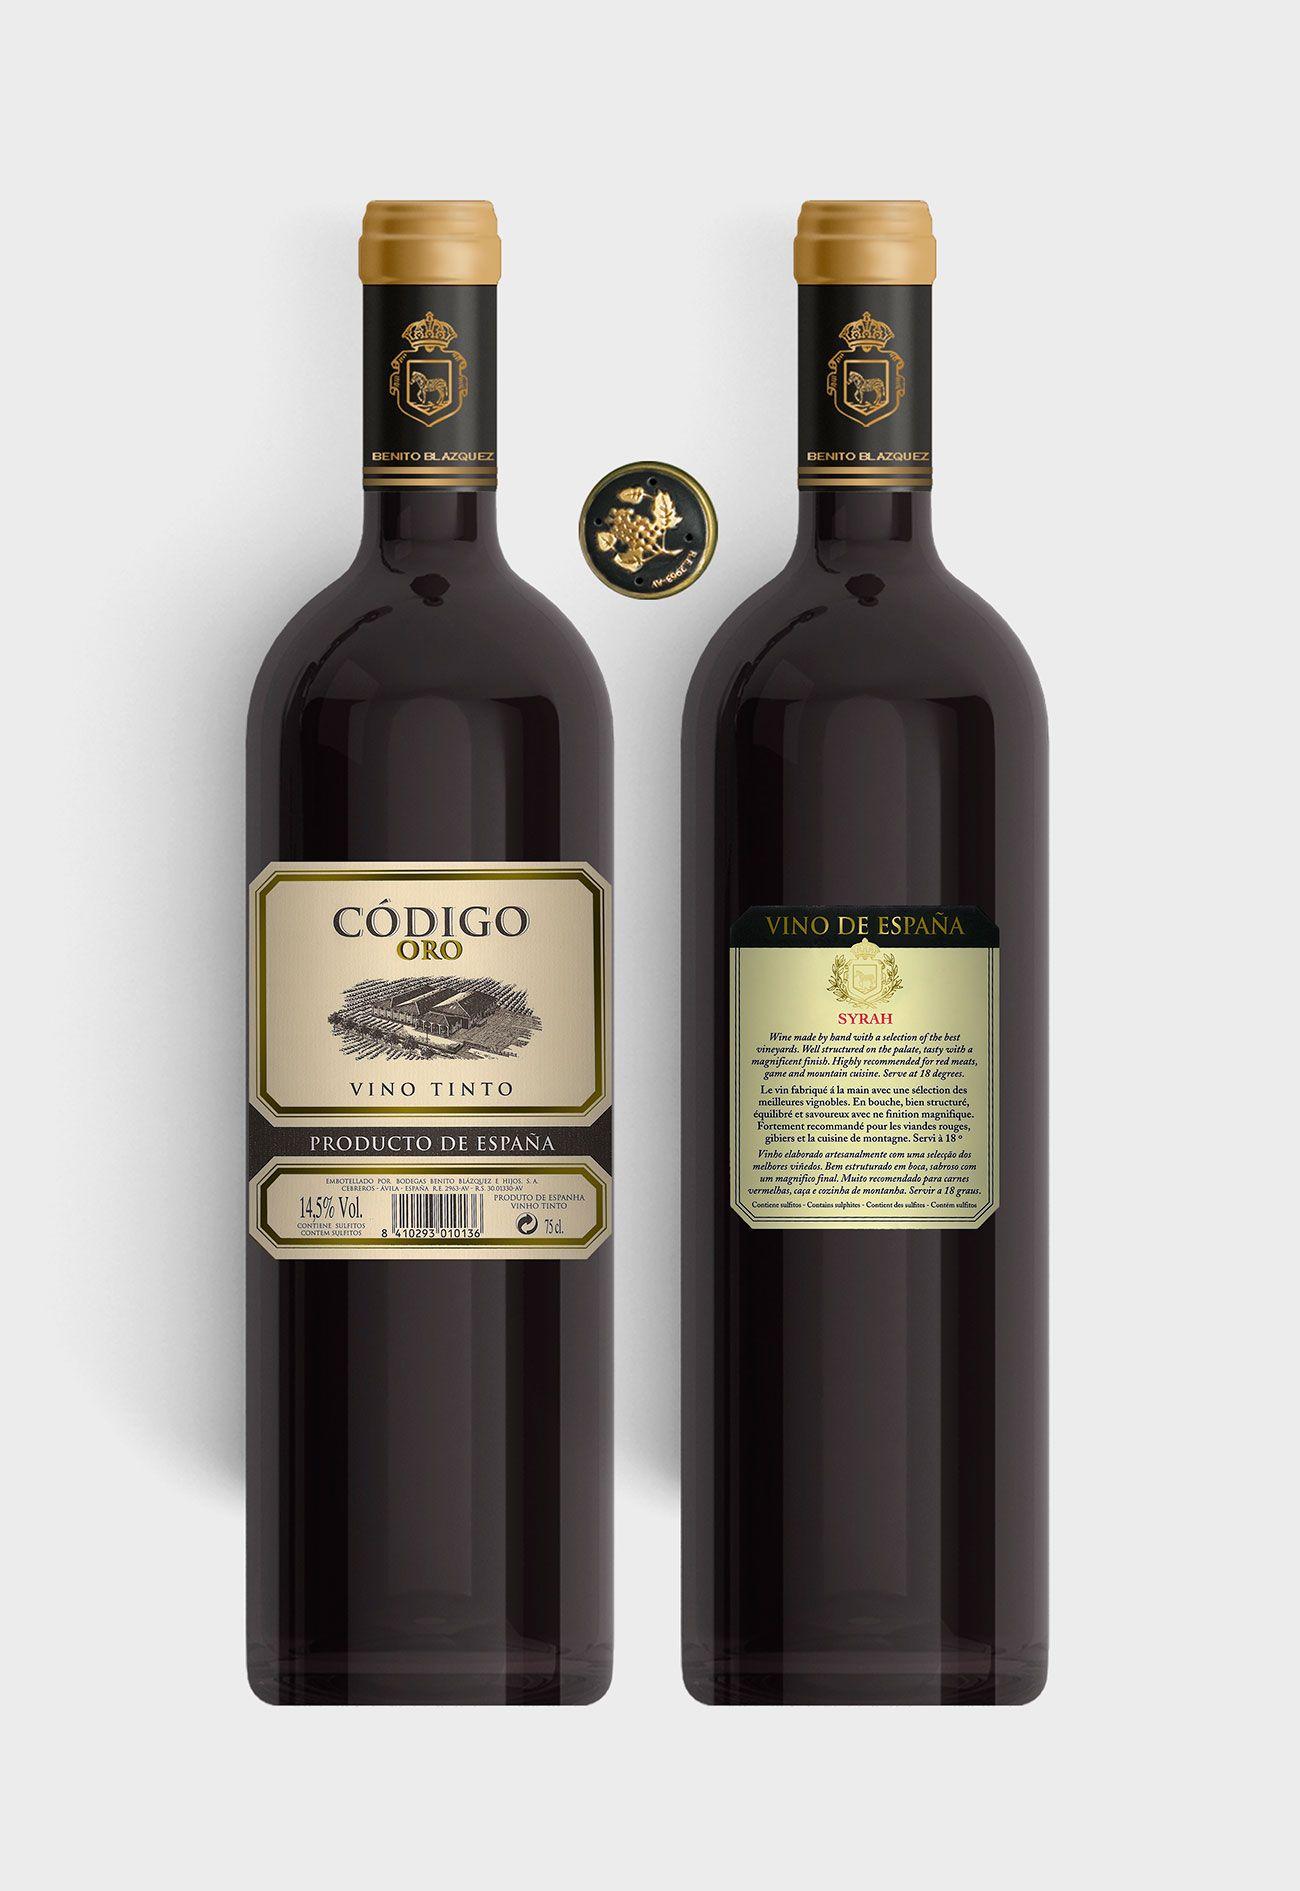 Benito Blázquez - Botella vino tinto Código Oro